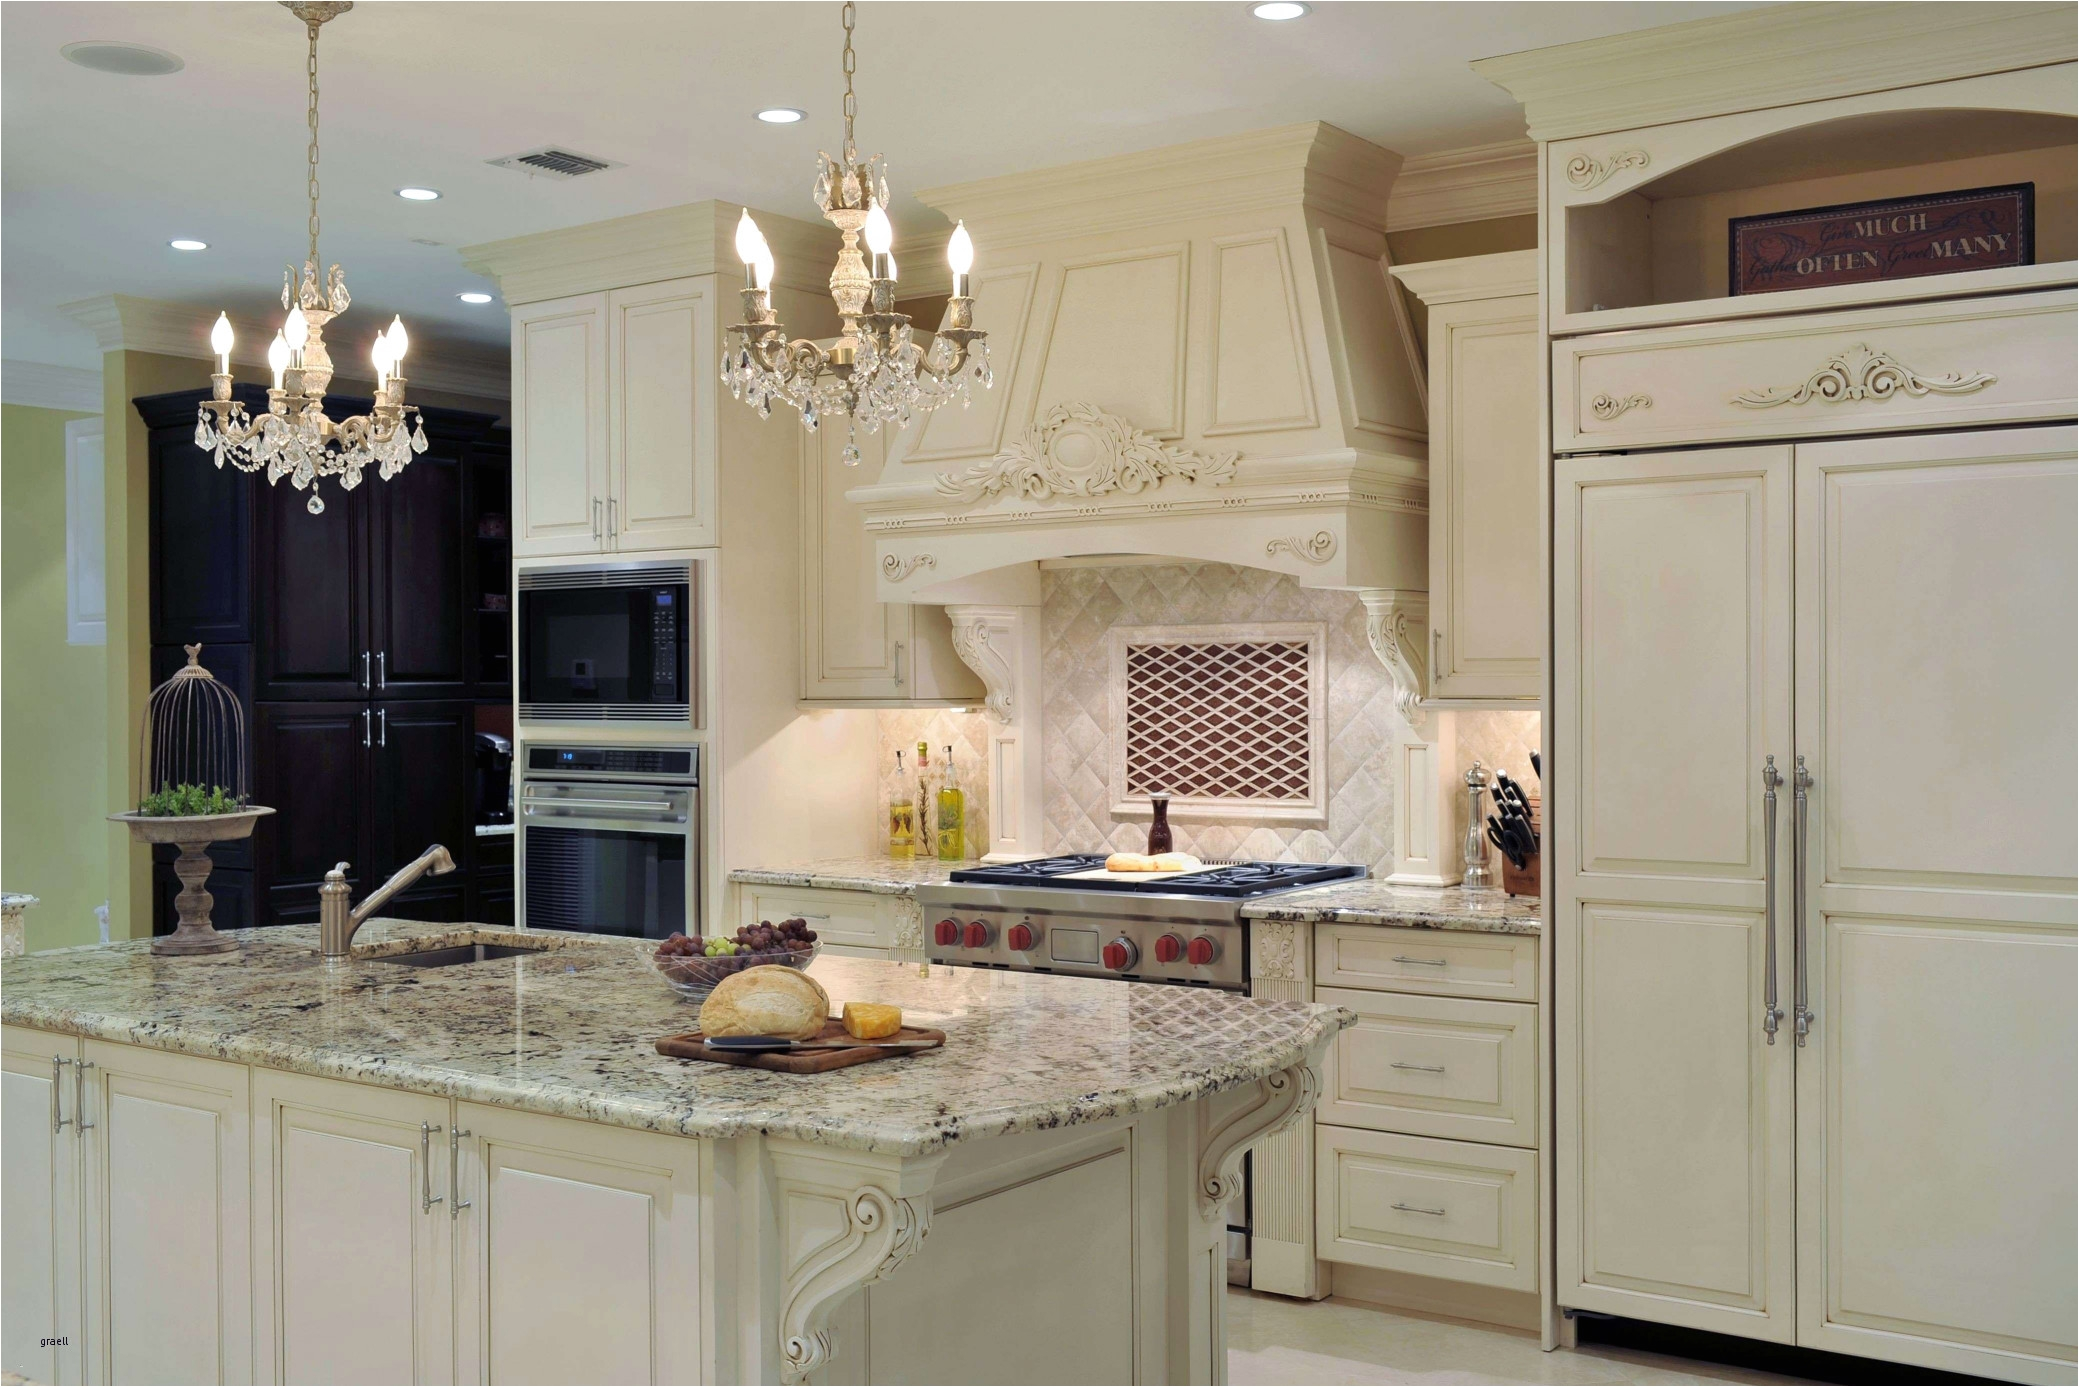 replace fluorescent light best 26 fresh replace fluorescent light fixture in kitchen